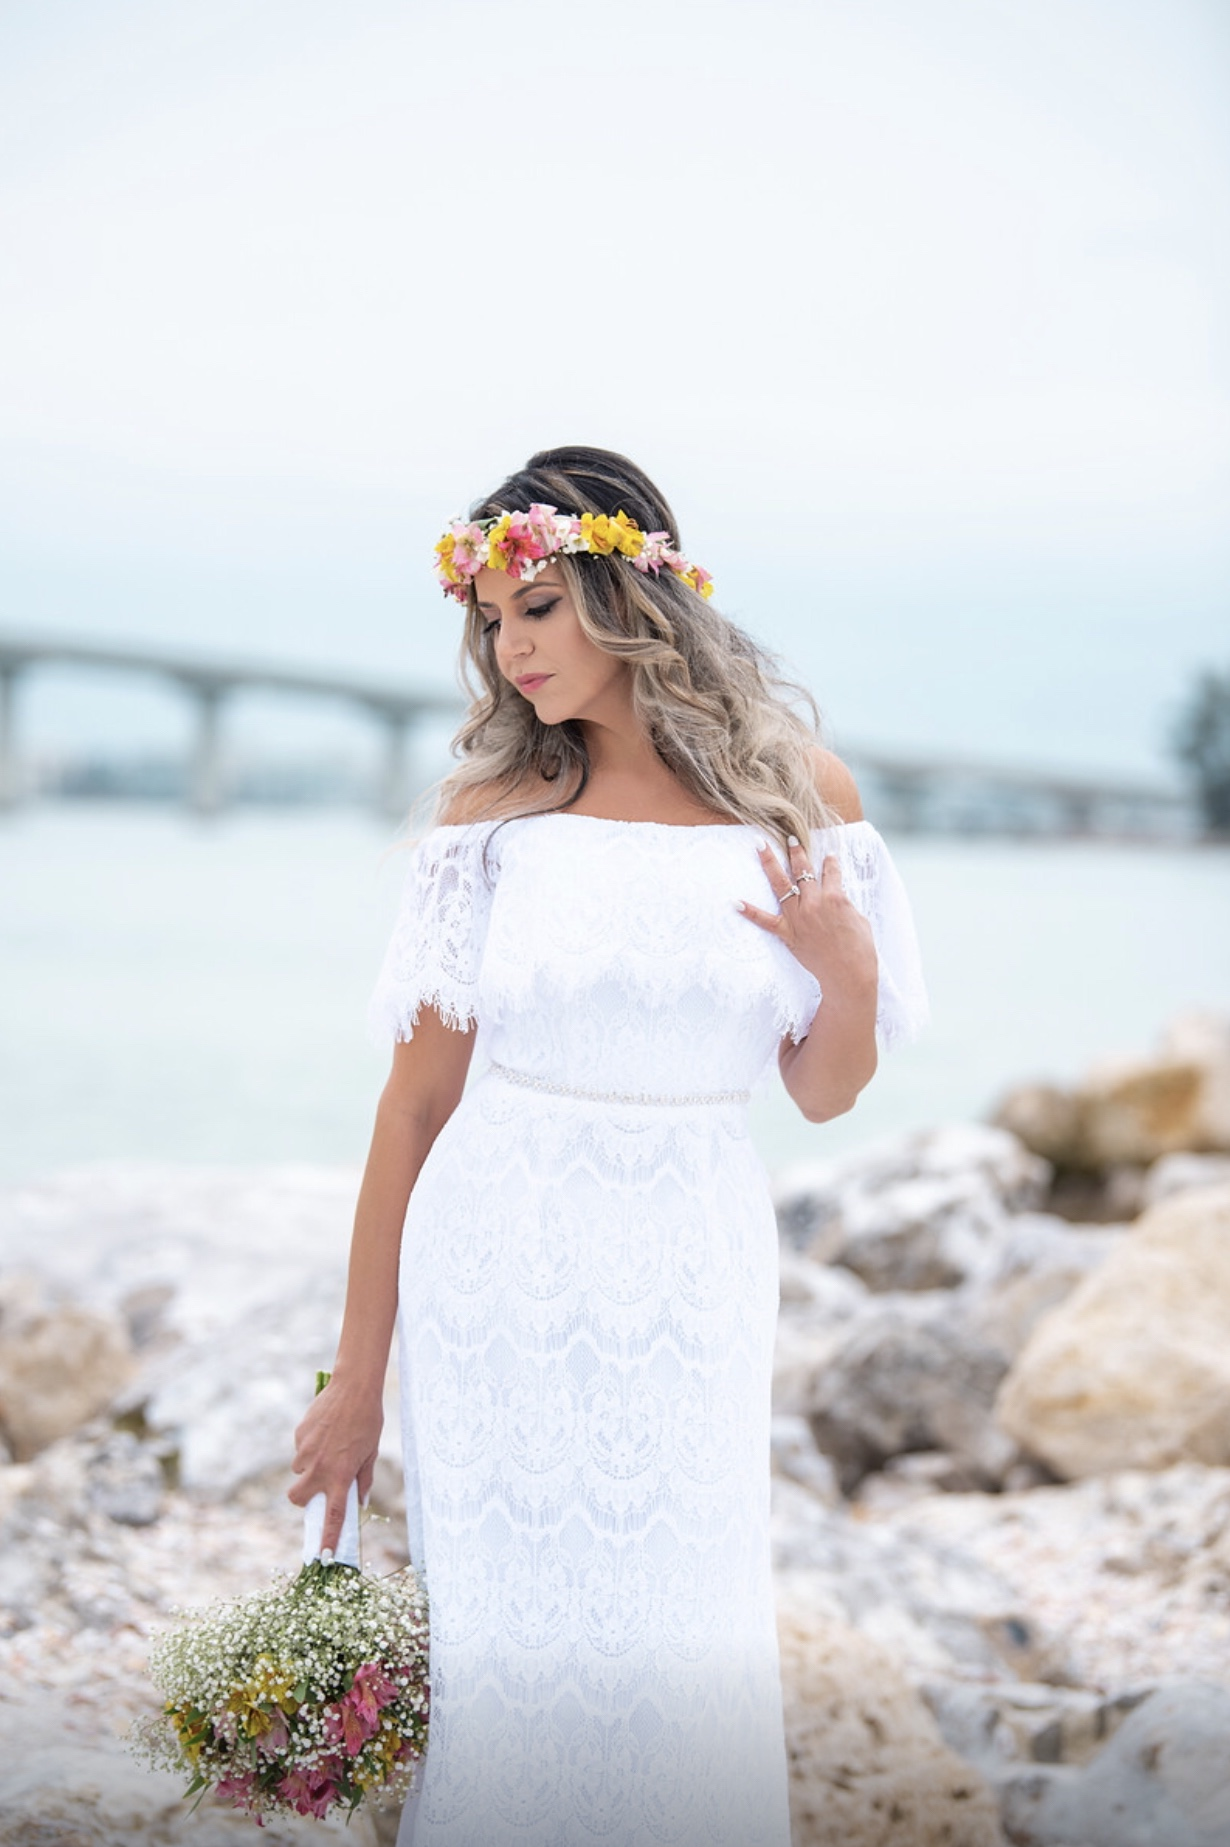 Step 5: Choose your photographer - Wedding Photography | Orlando, Miami, Tampa, Jacksonville, St.Augustine, FL